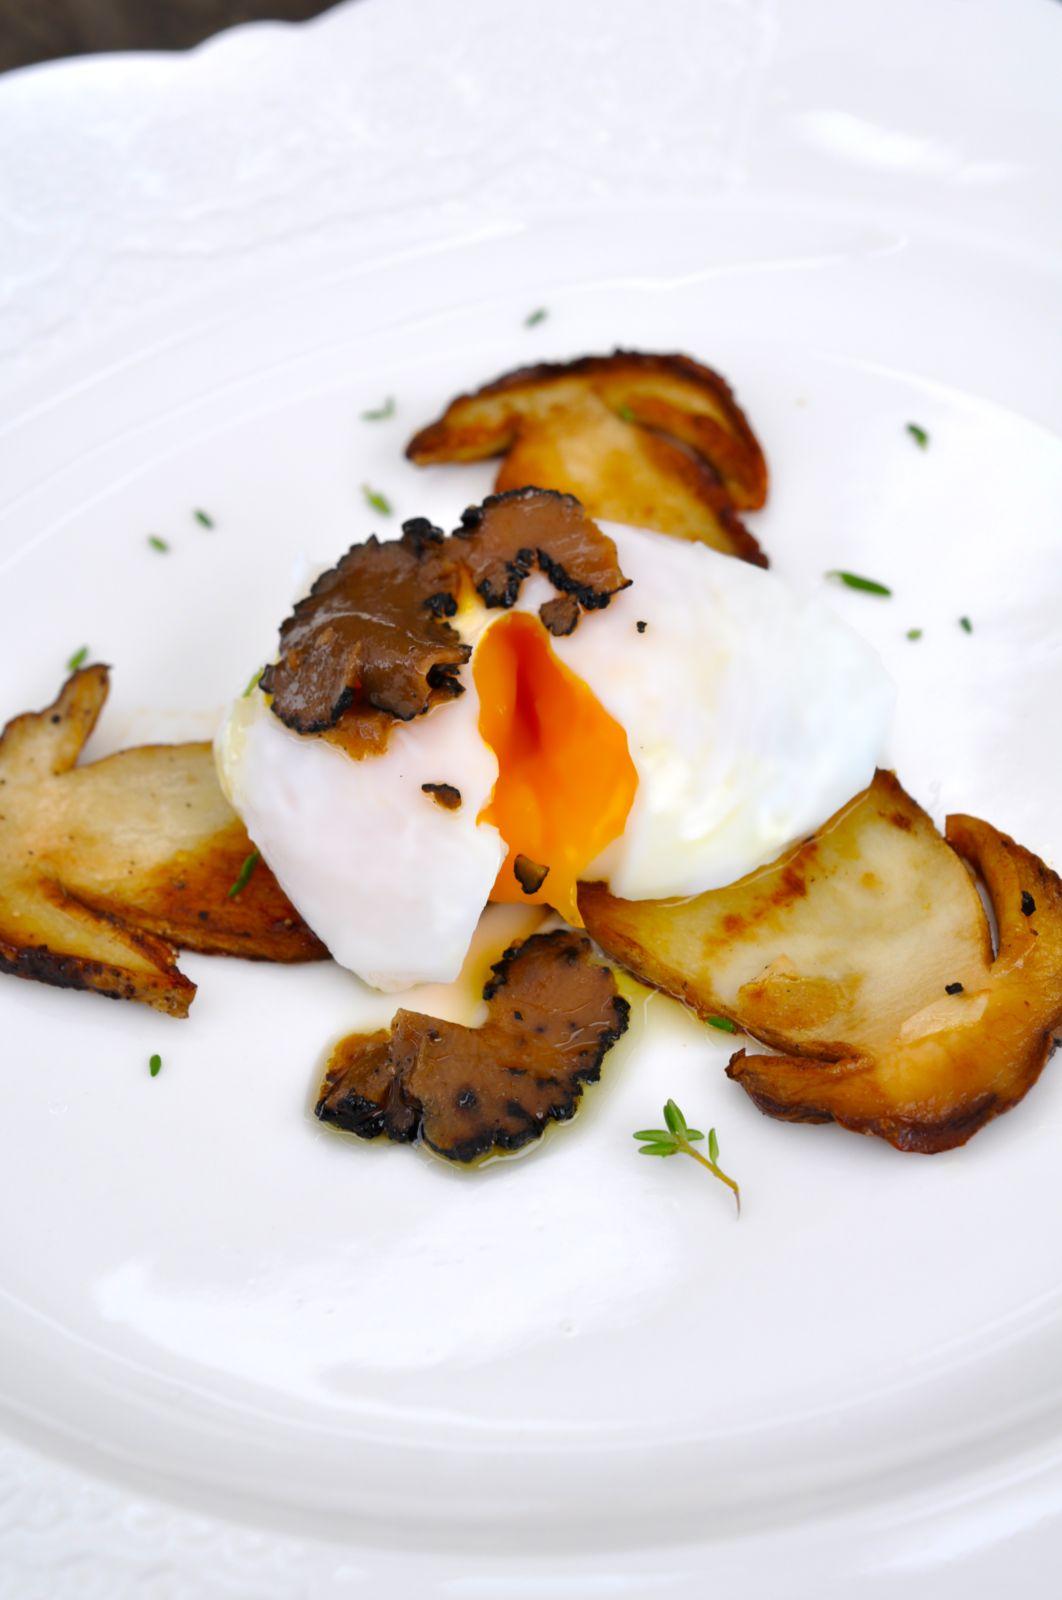 posirano-jajce-sousvide